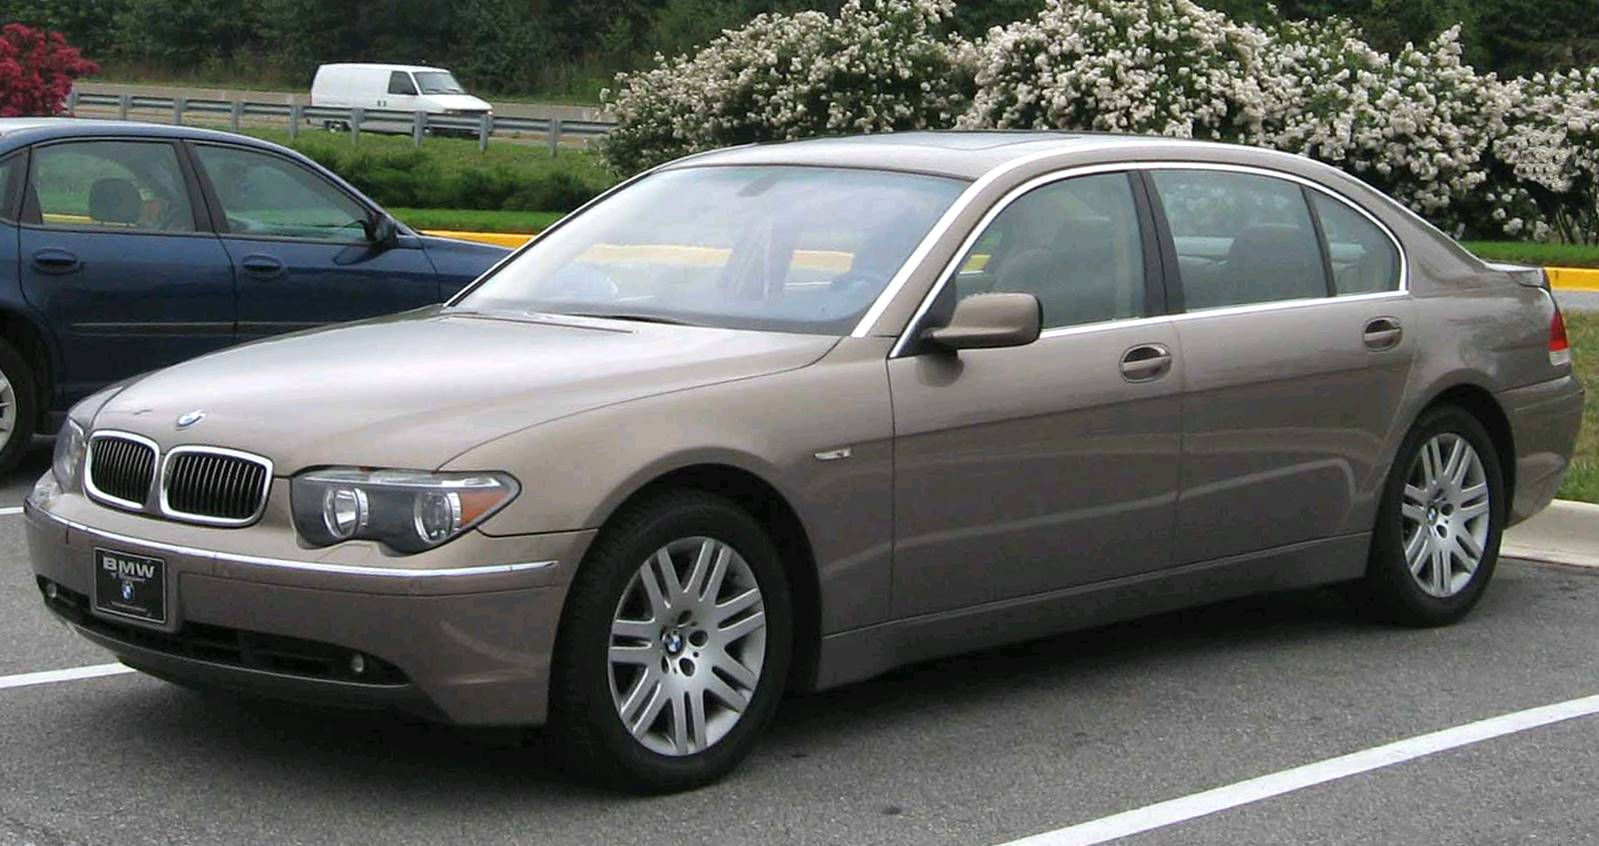 2002 bmw 325i 0-60 manual